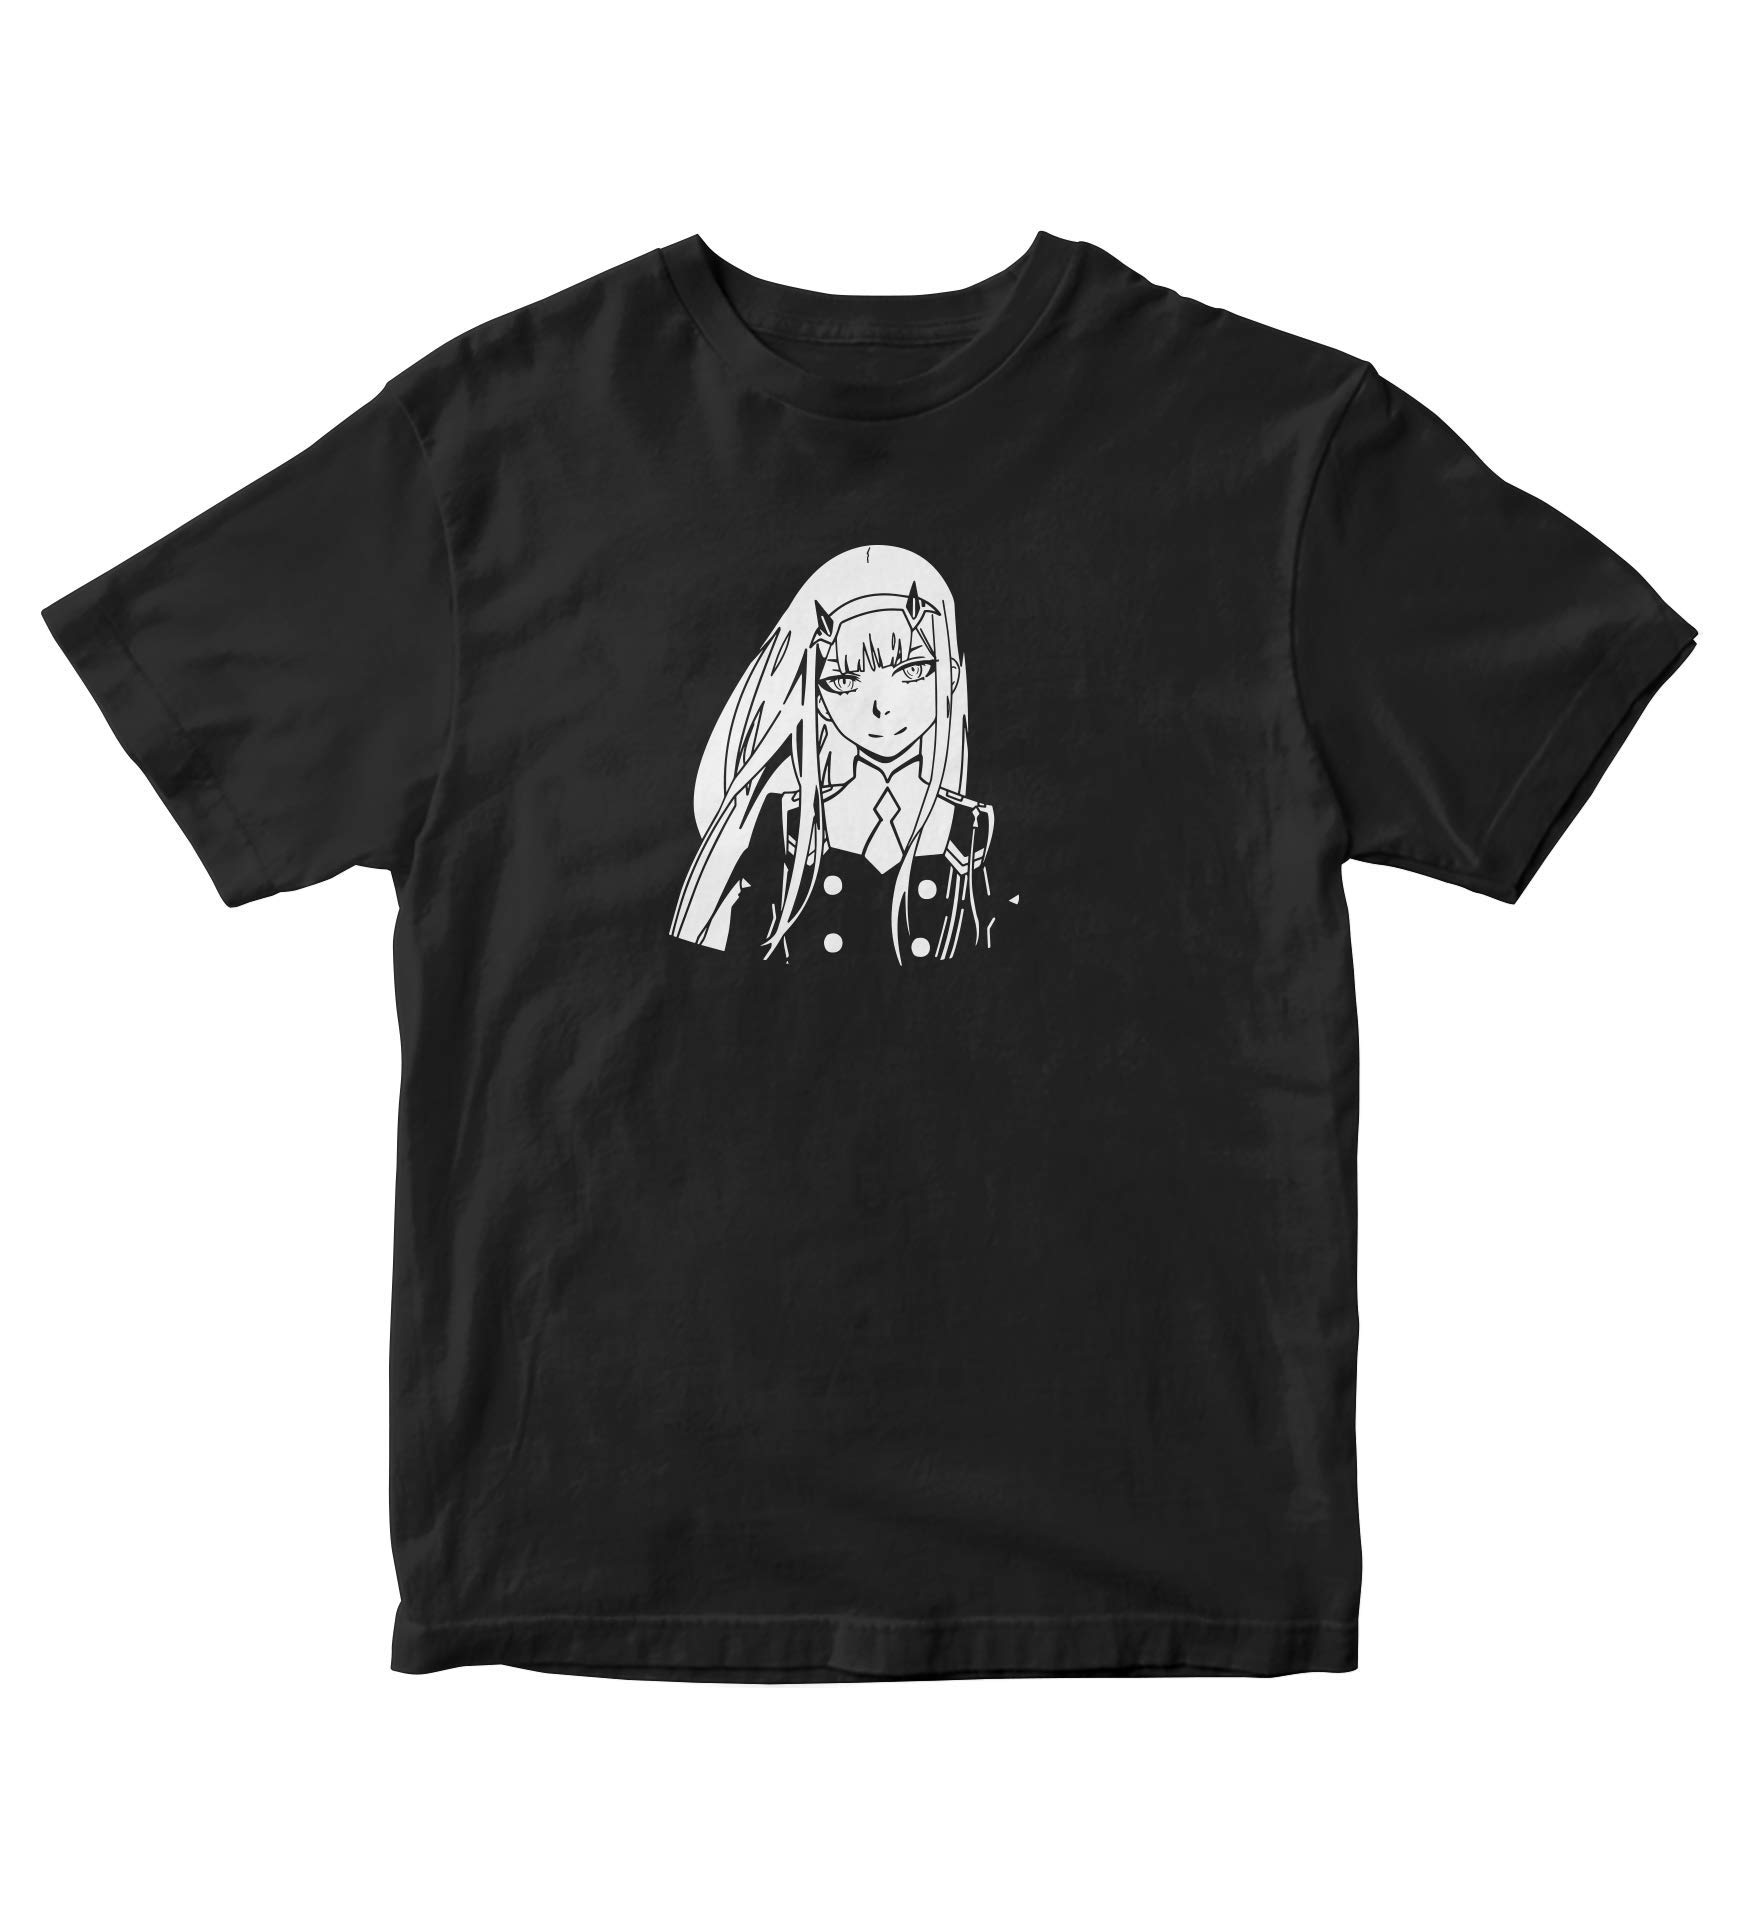 Zero Two Silhouette Shirt Darling In The Franxx Anime Manga Man S Black A836